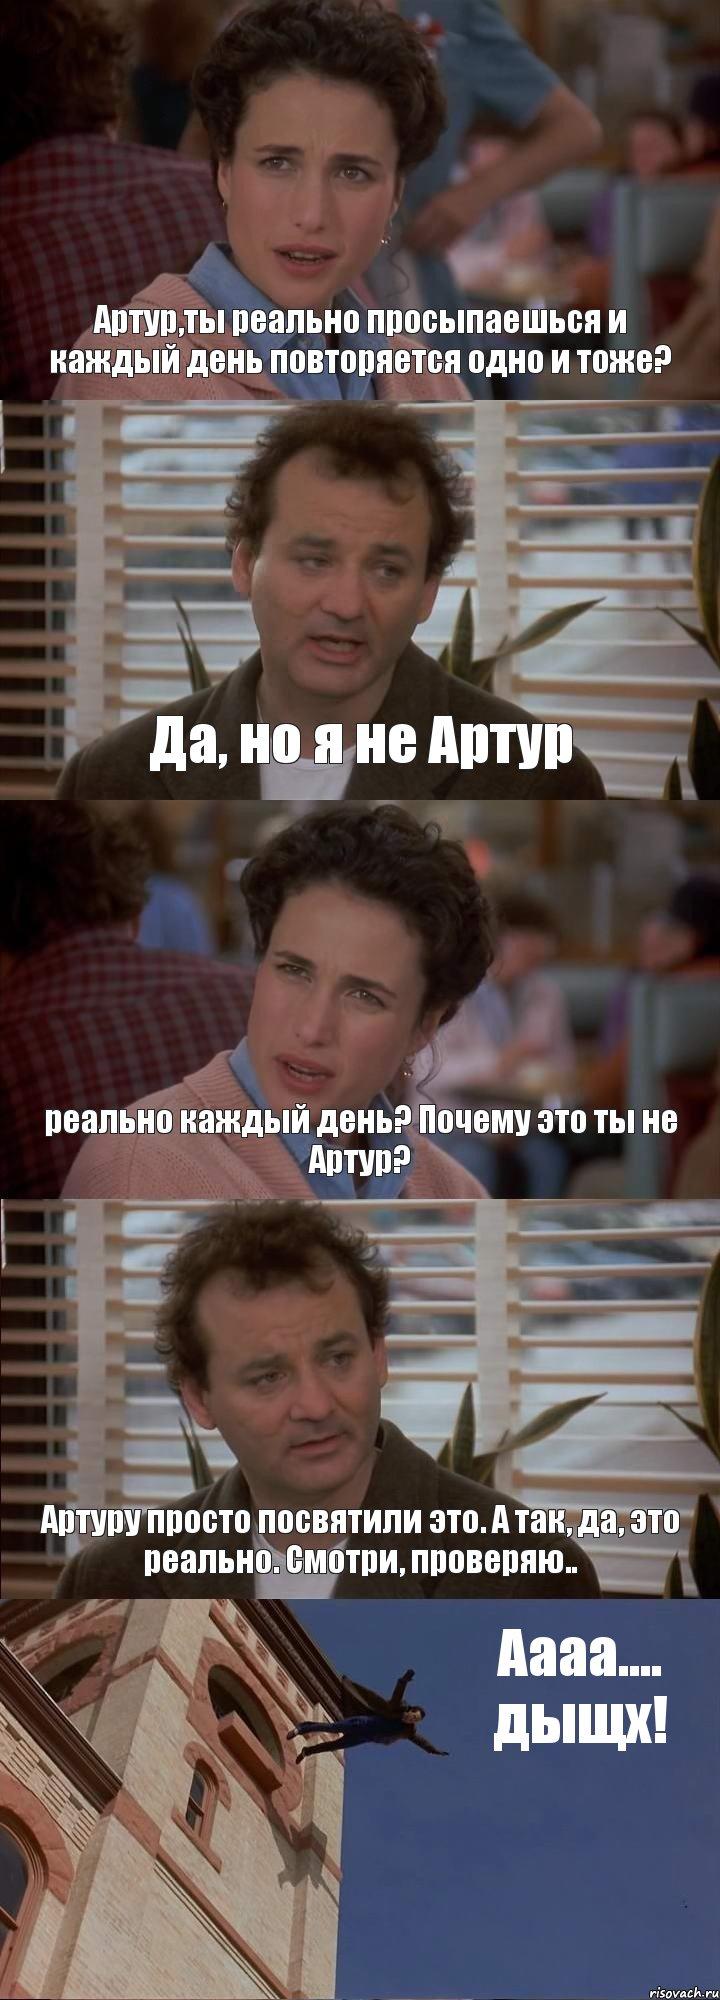 артур а ты: